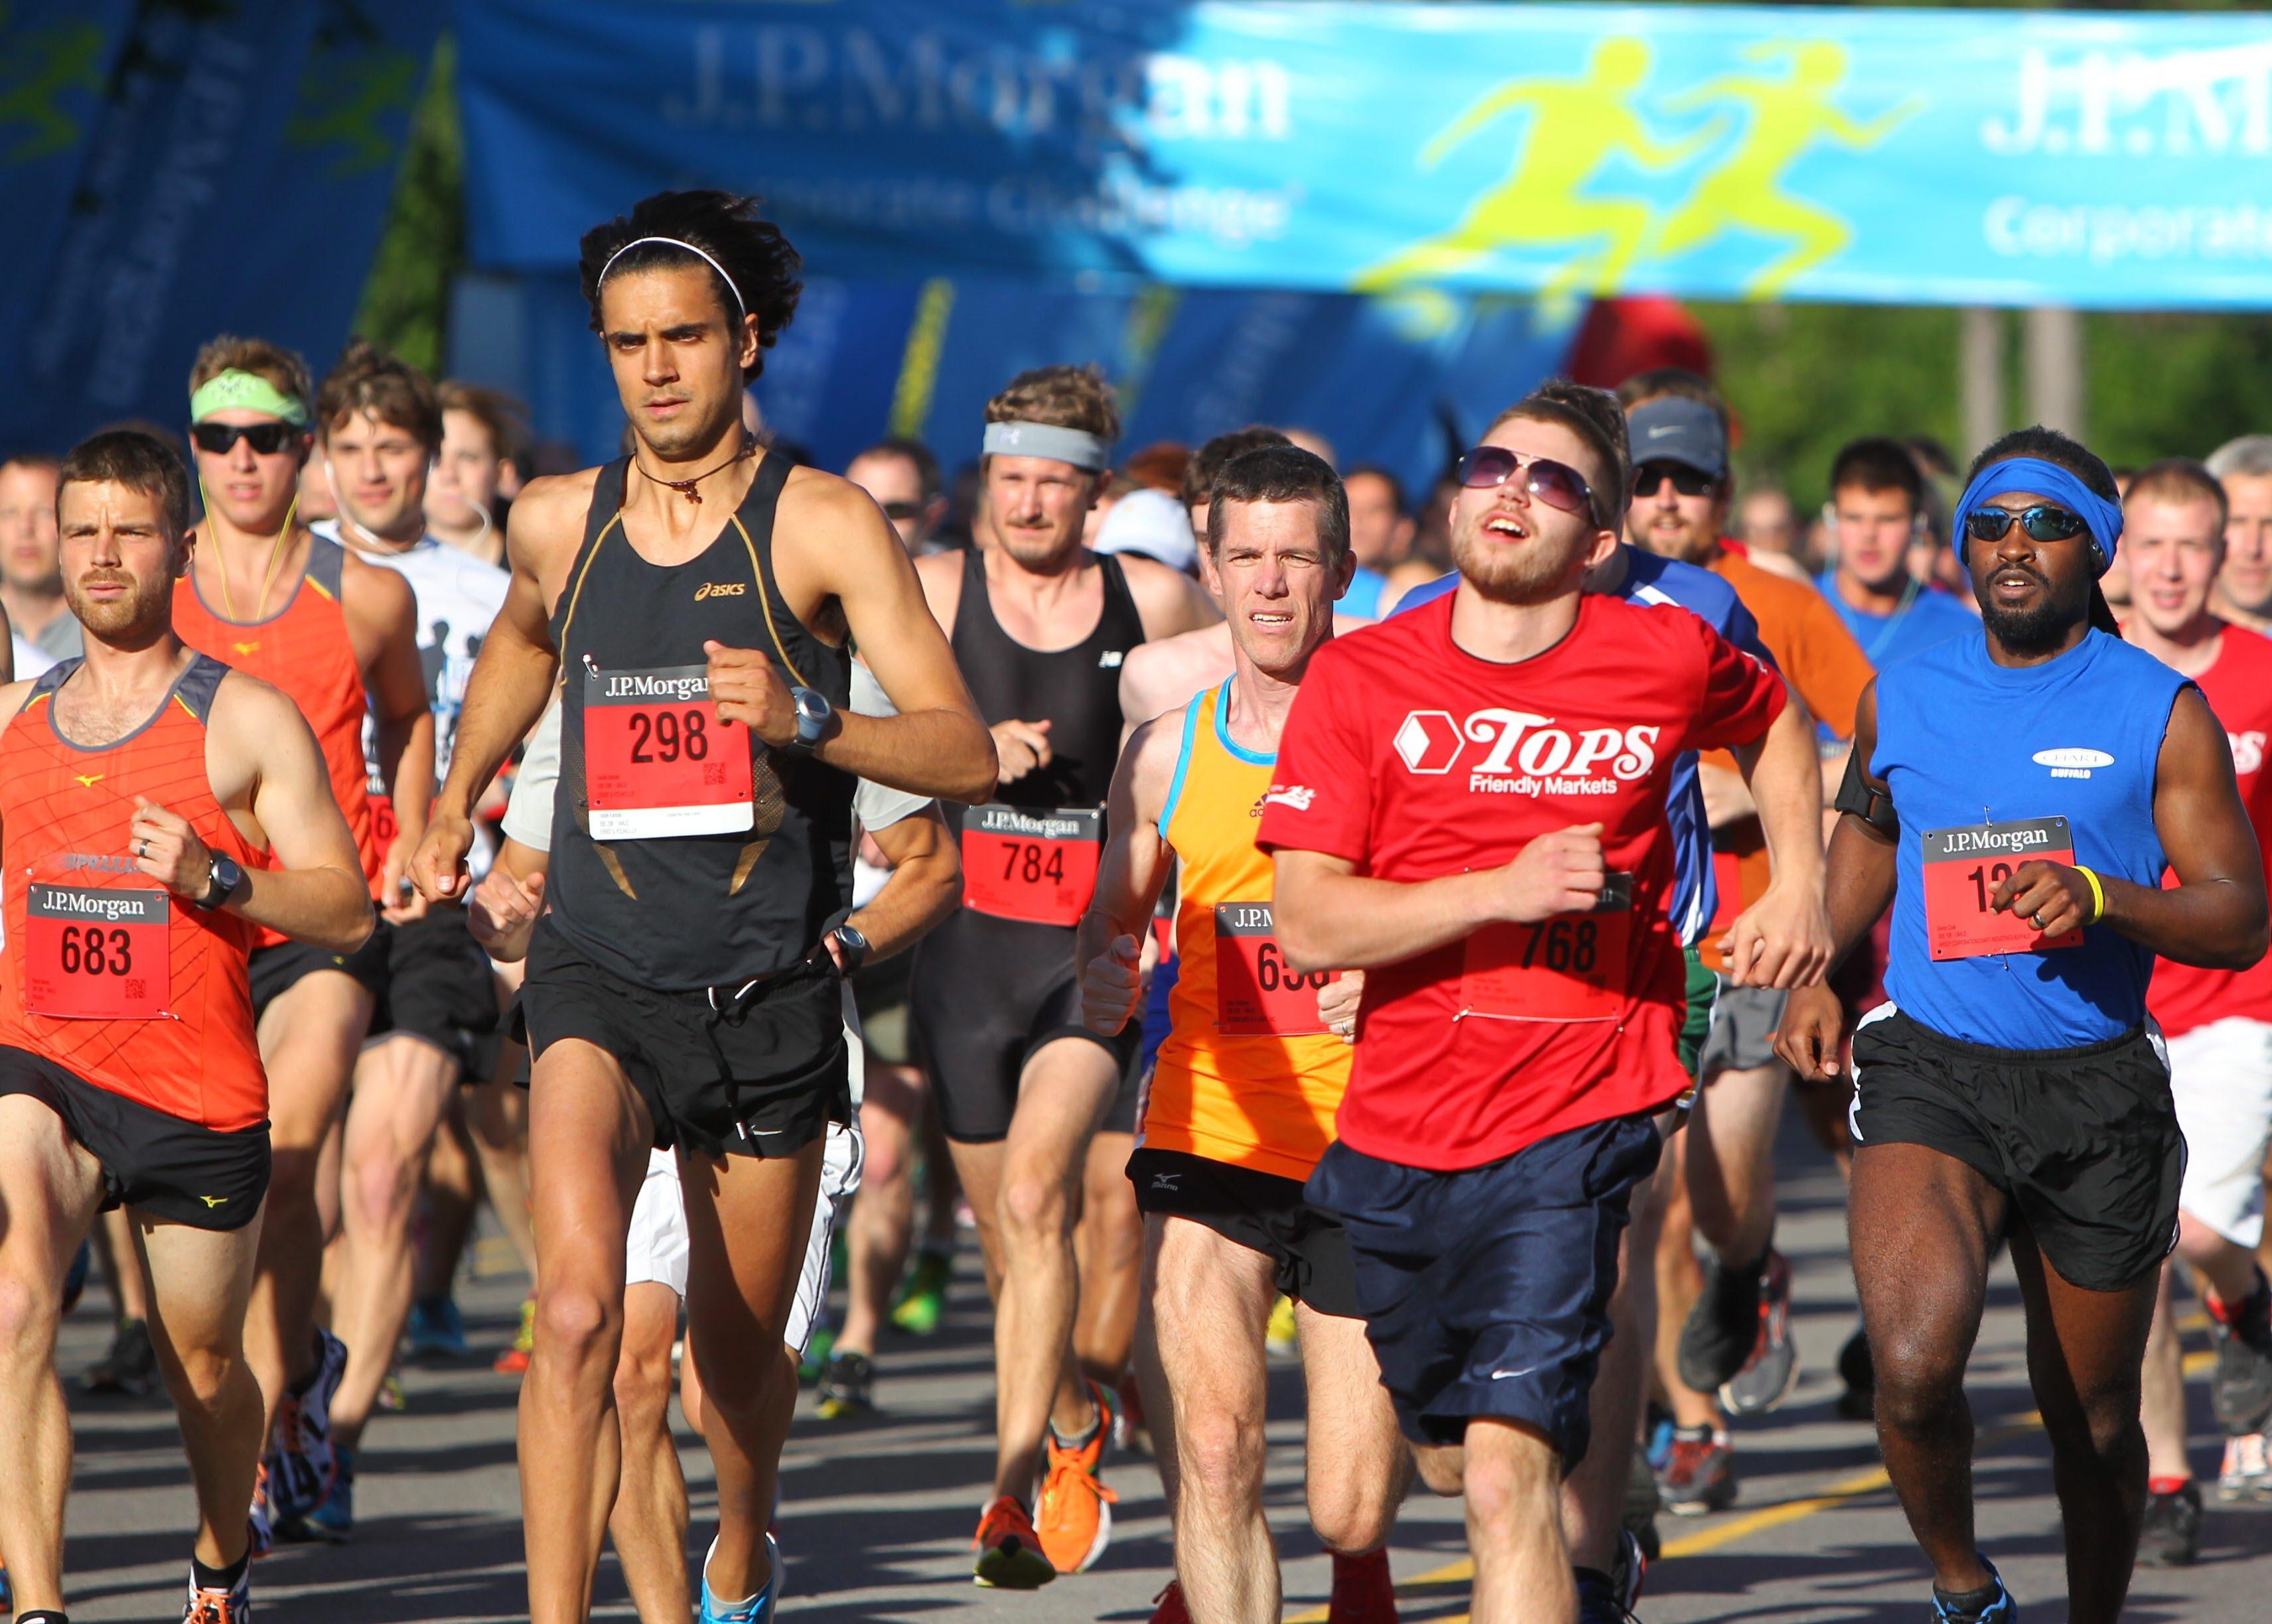 Men's winner Vasilis Kariolis, left in black, and other runners takes the start during the J.P. Morgan Corporate Challenge in Delaware Park in Buffalo on June 19.